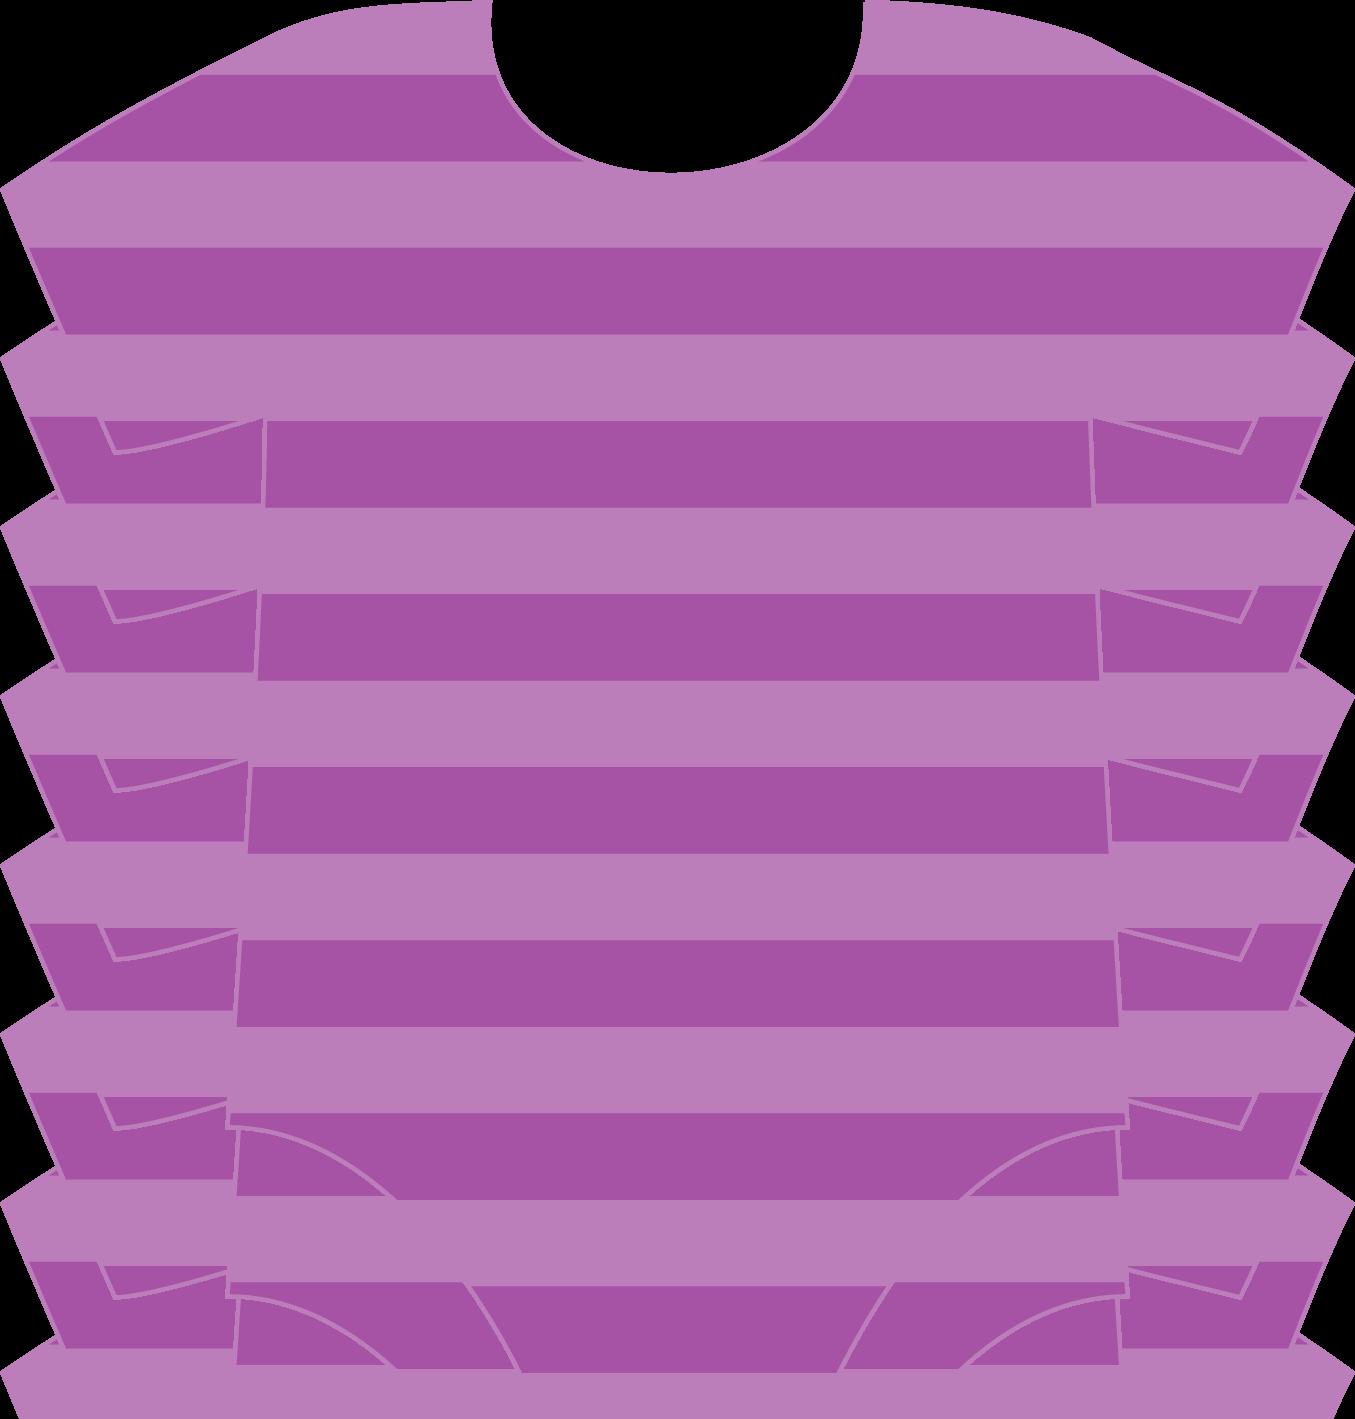 Photo by selmabuenoaltran minus. Pajamas clipart baby overalls